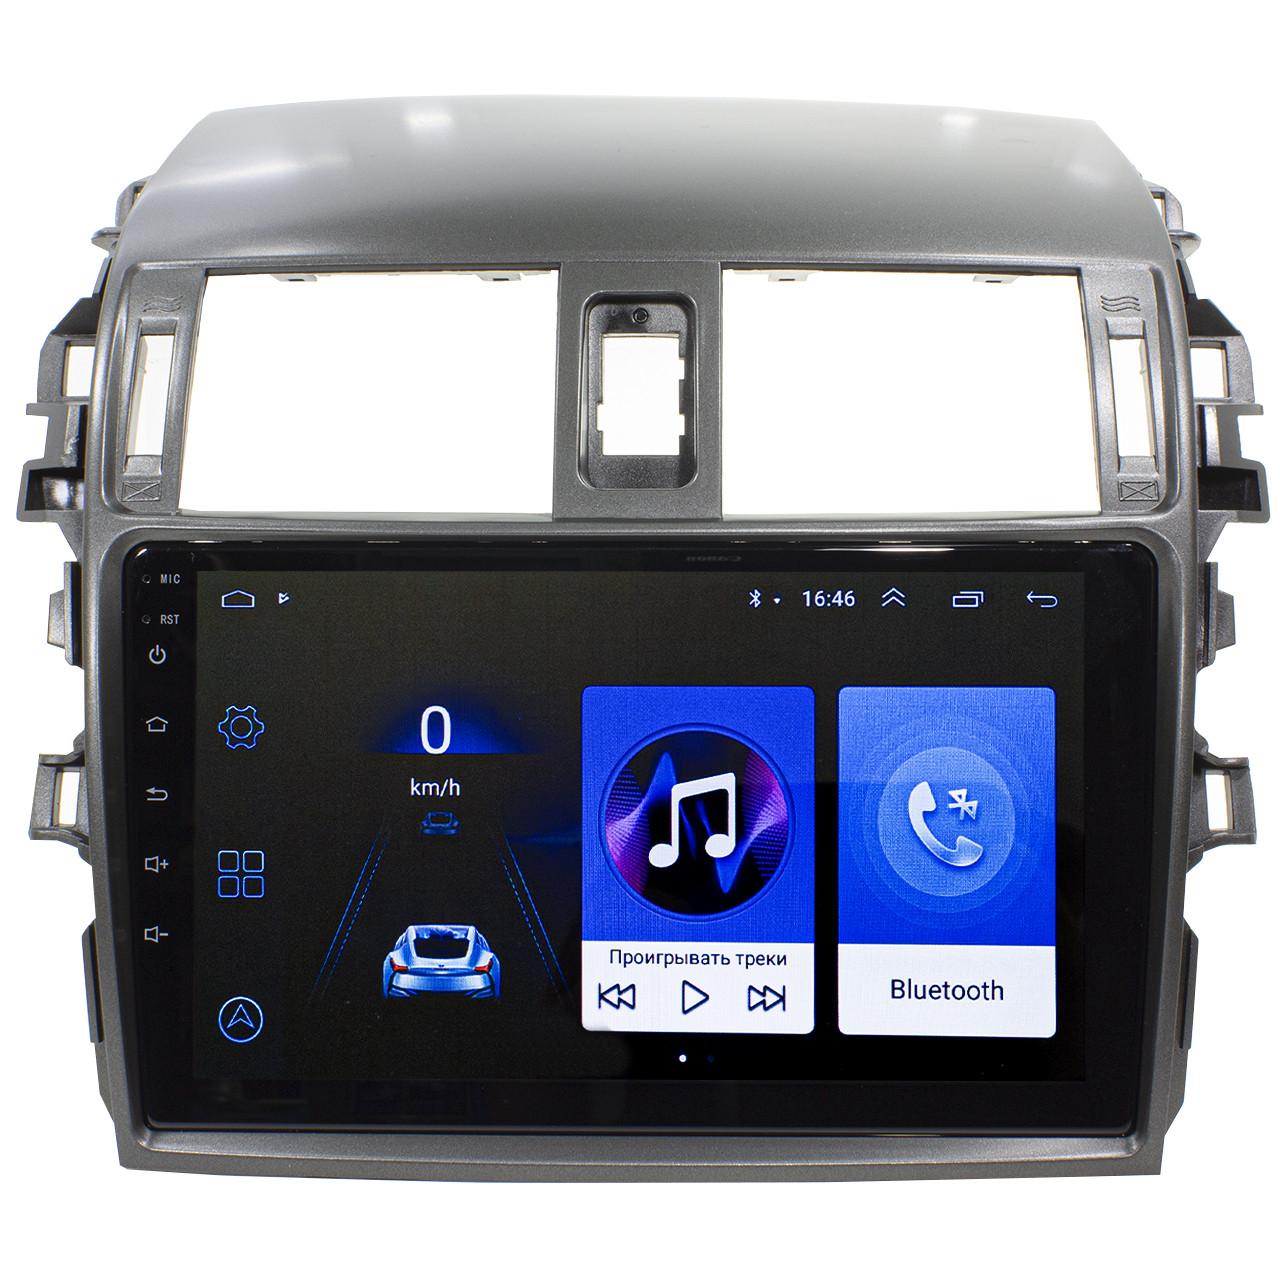 "Штатная автомобильная магнитола Toyota Corolla 9"" (2009-2013г.) сенсор WiFi GPS 4 ядра 1/16 Гб GPS Android"